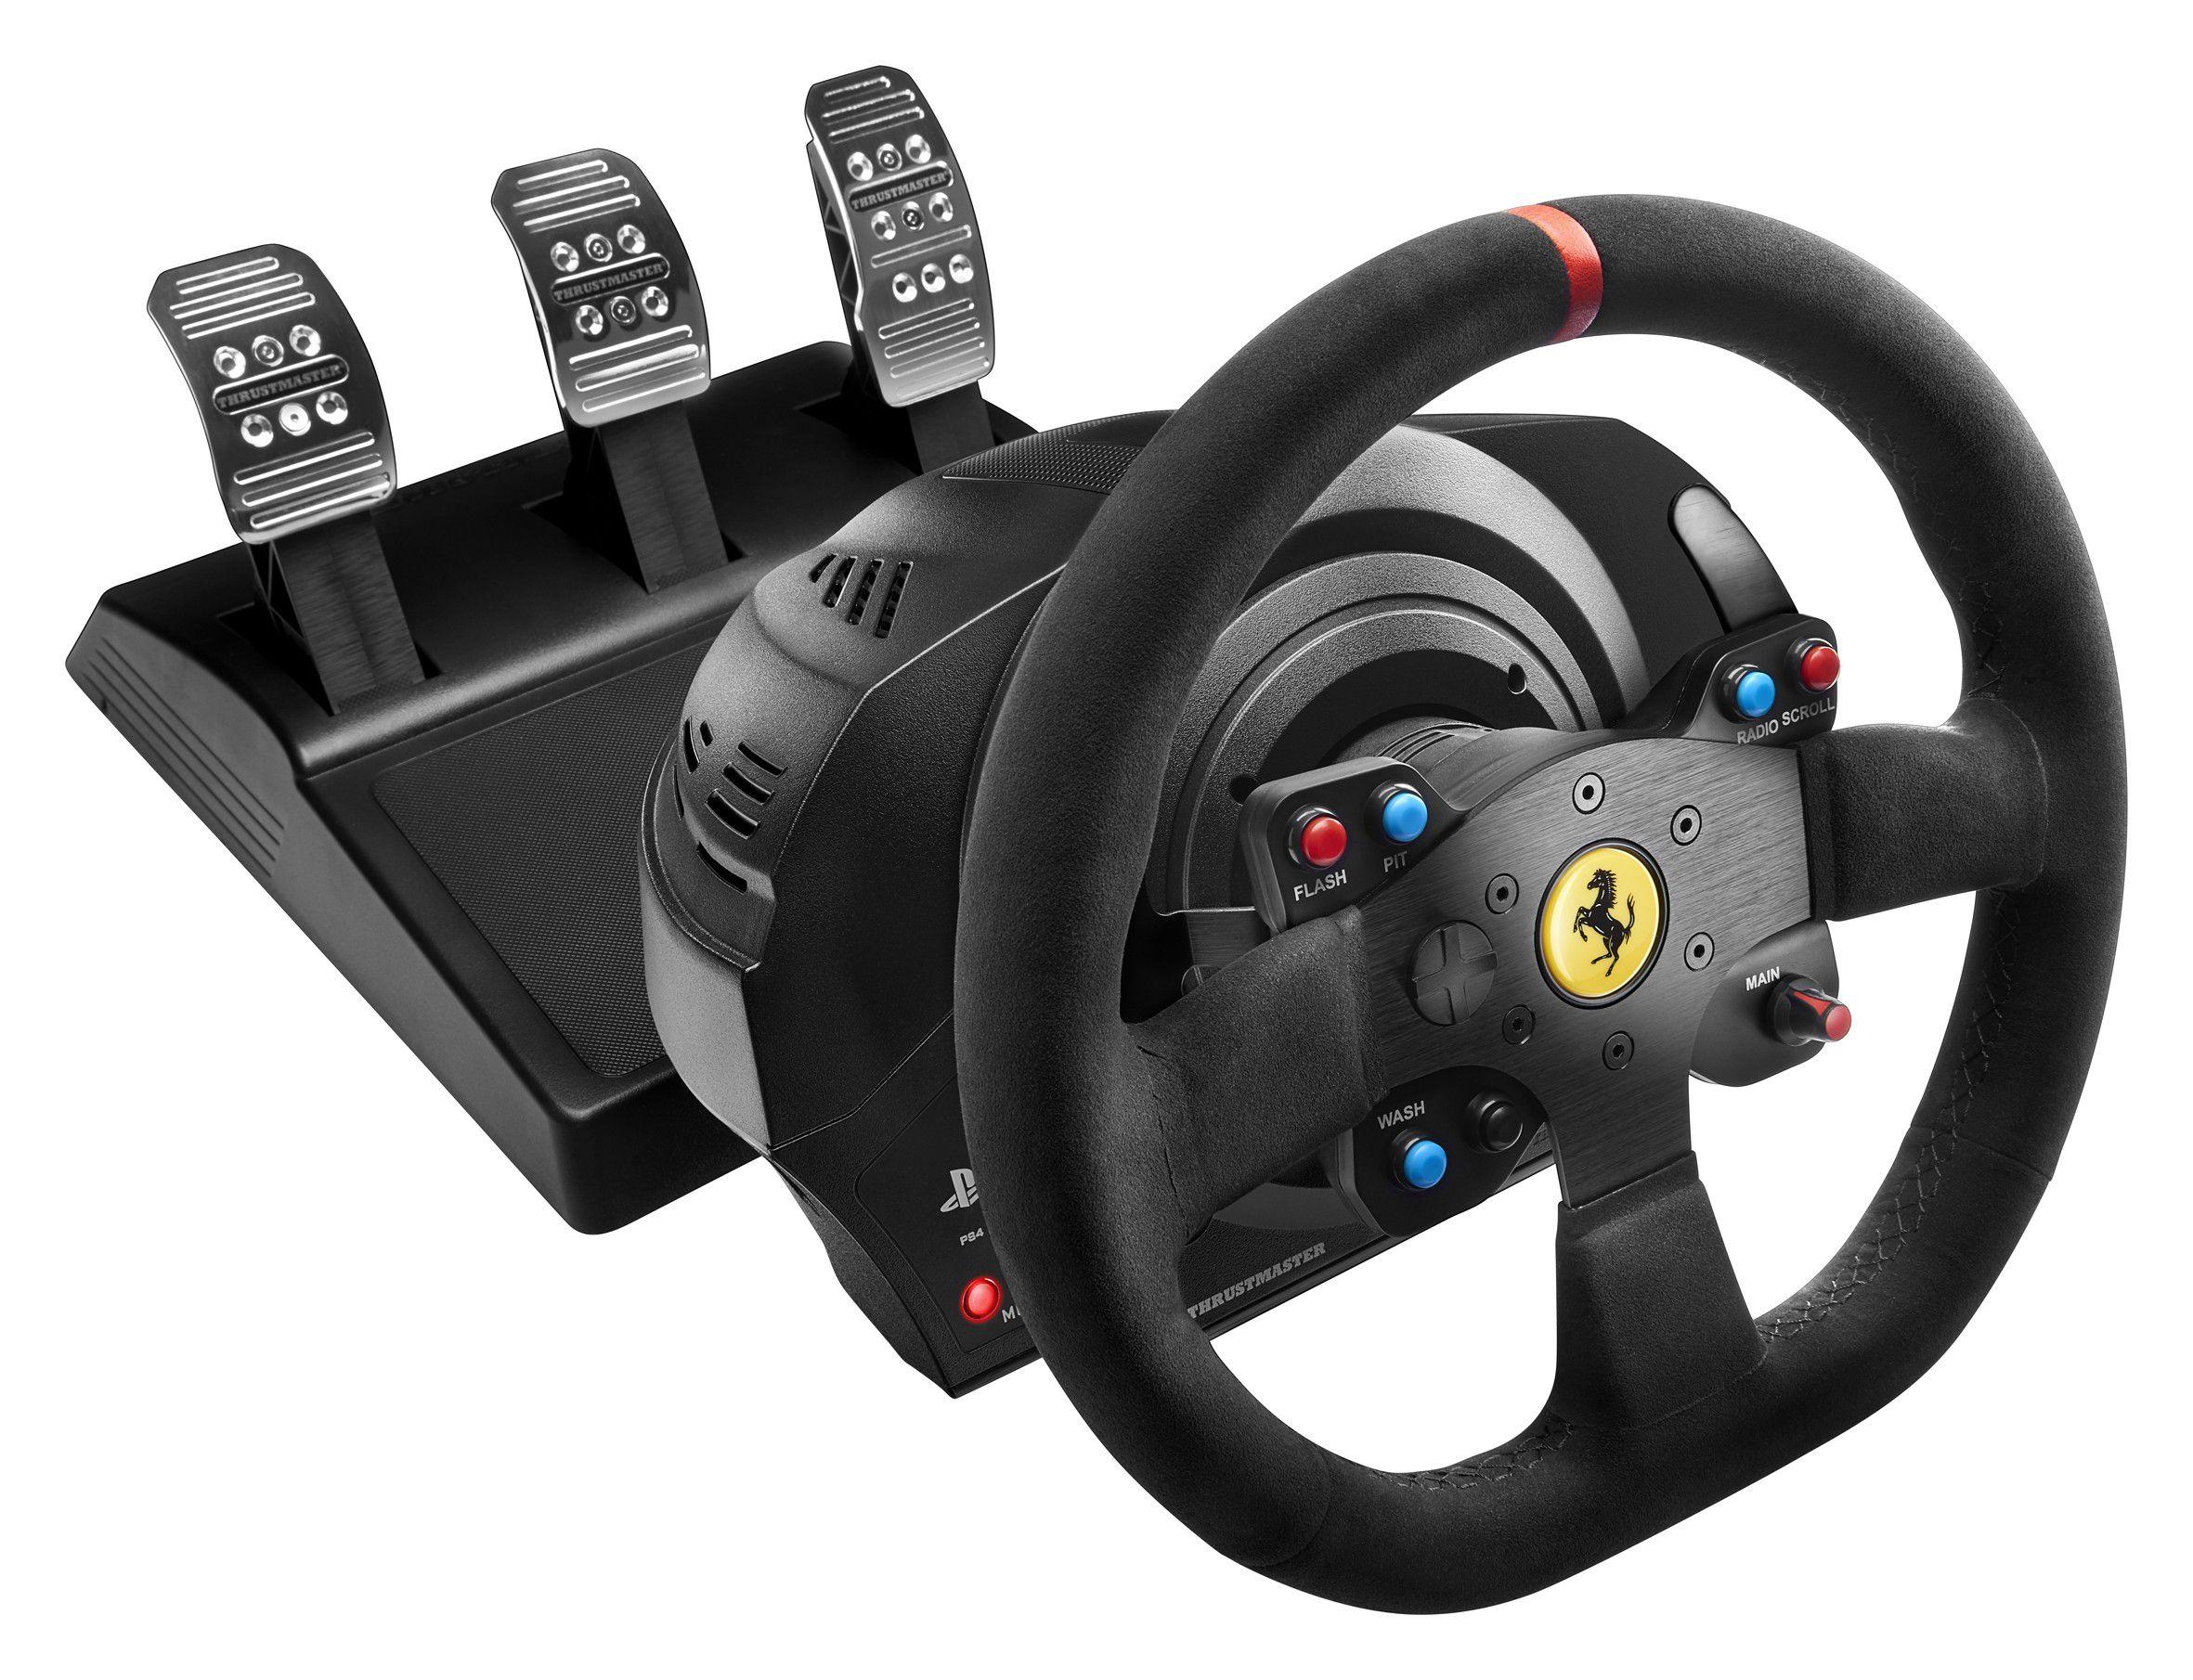 thrustmaster t300 ferrari integral racing wheel alcantara edition test complet volant les. Black Bedroom Furniture Sets. Home Design Ideas